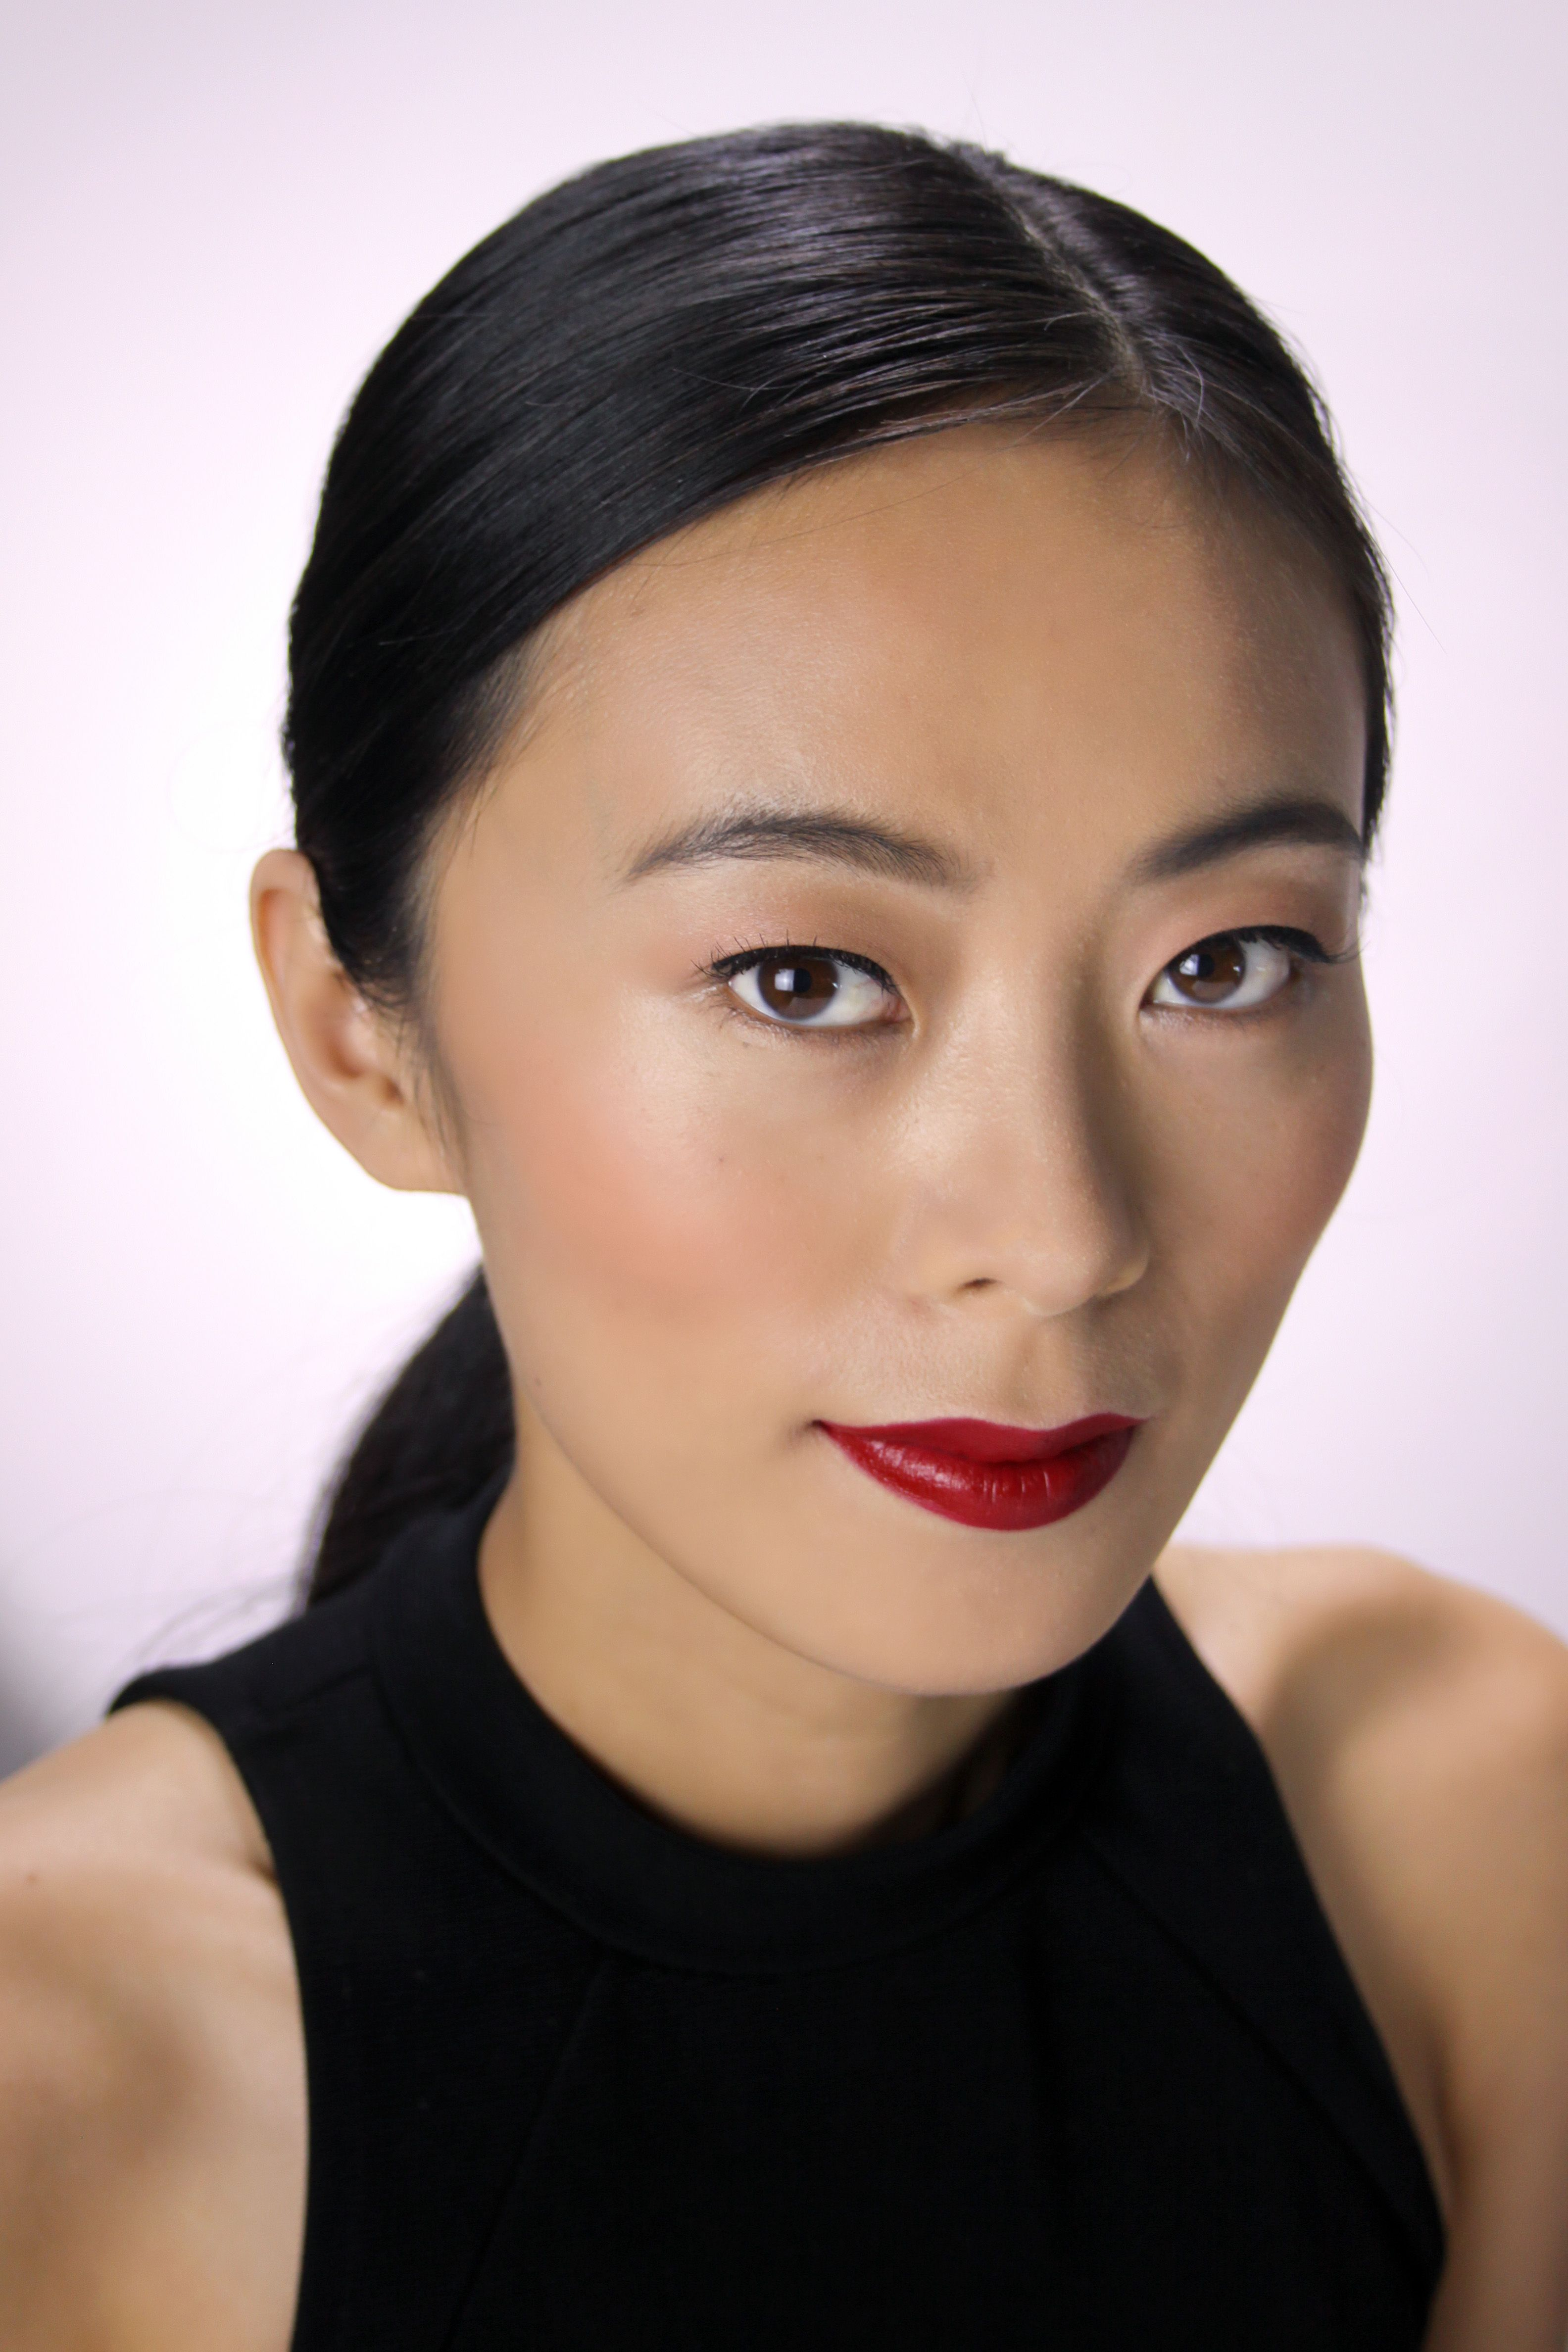 Photos diy wedding makeup of makeup makeover androids hd pics pin by mitsu sato on bridal and